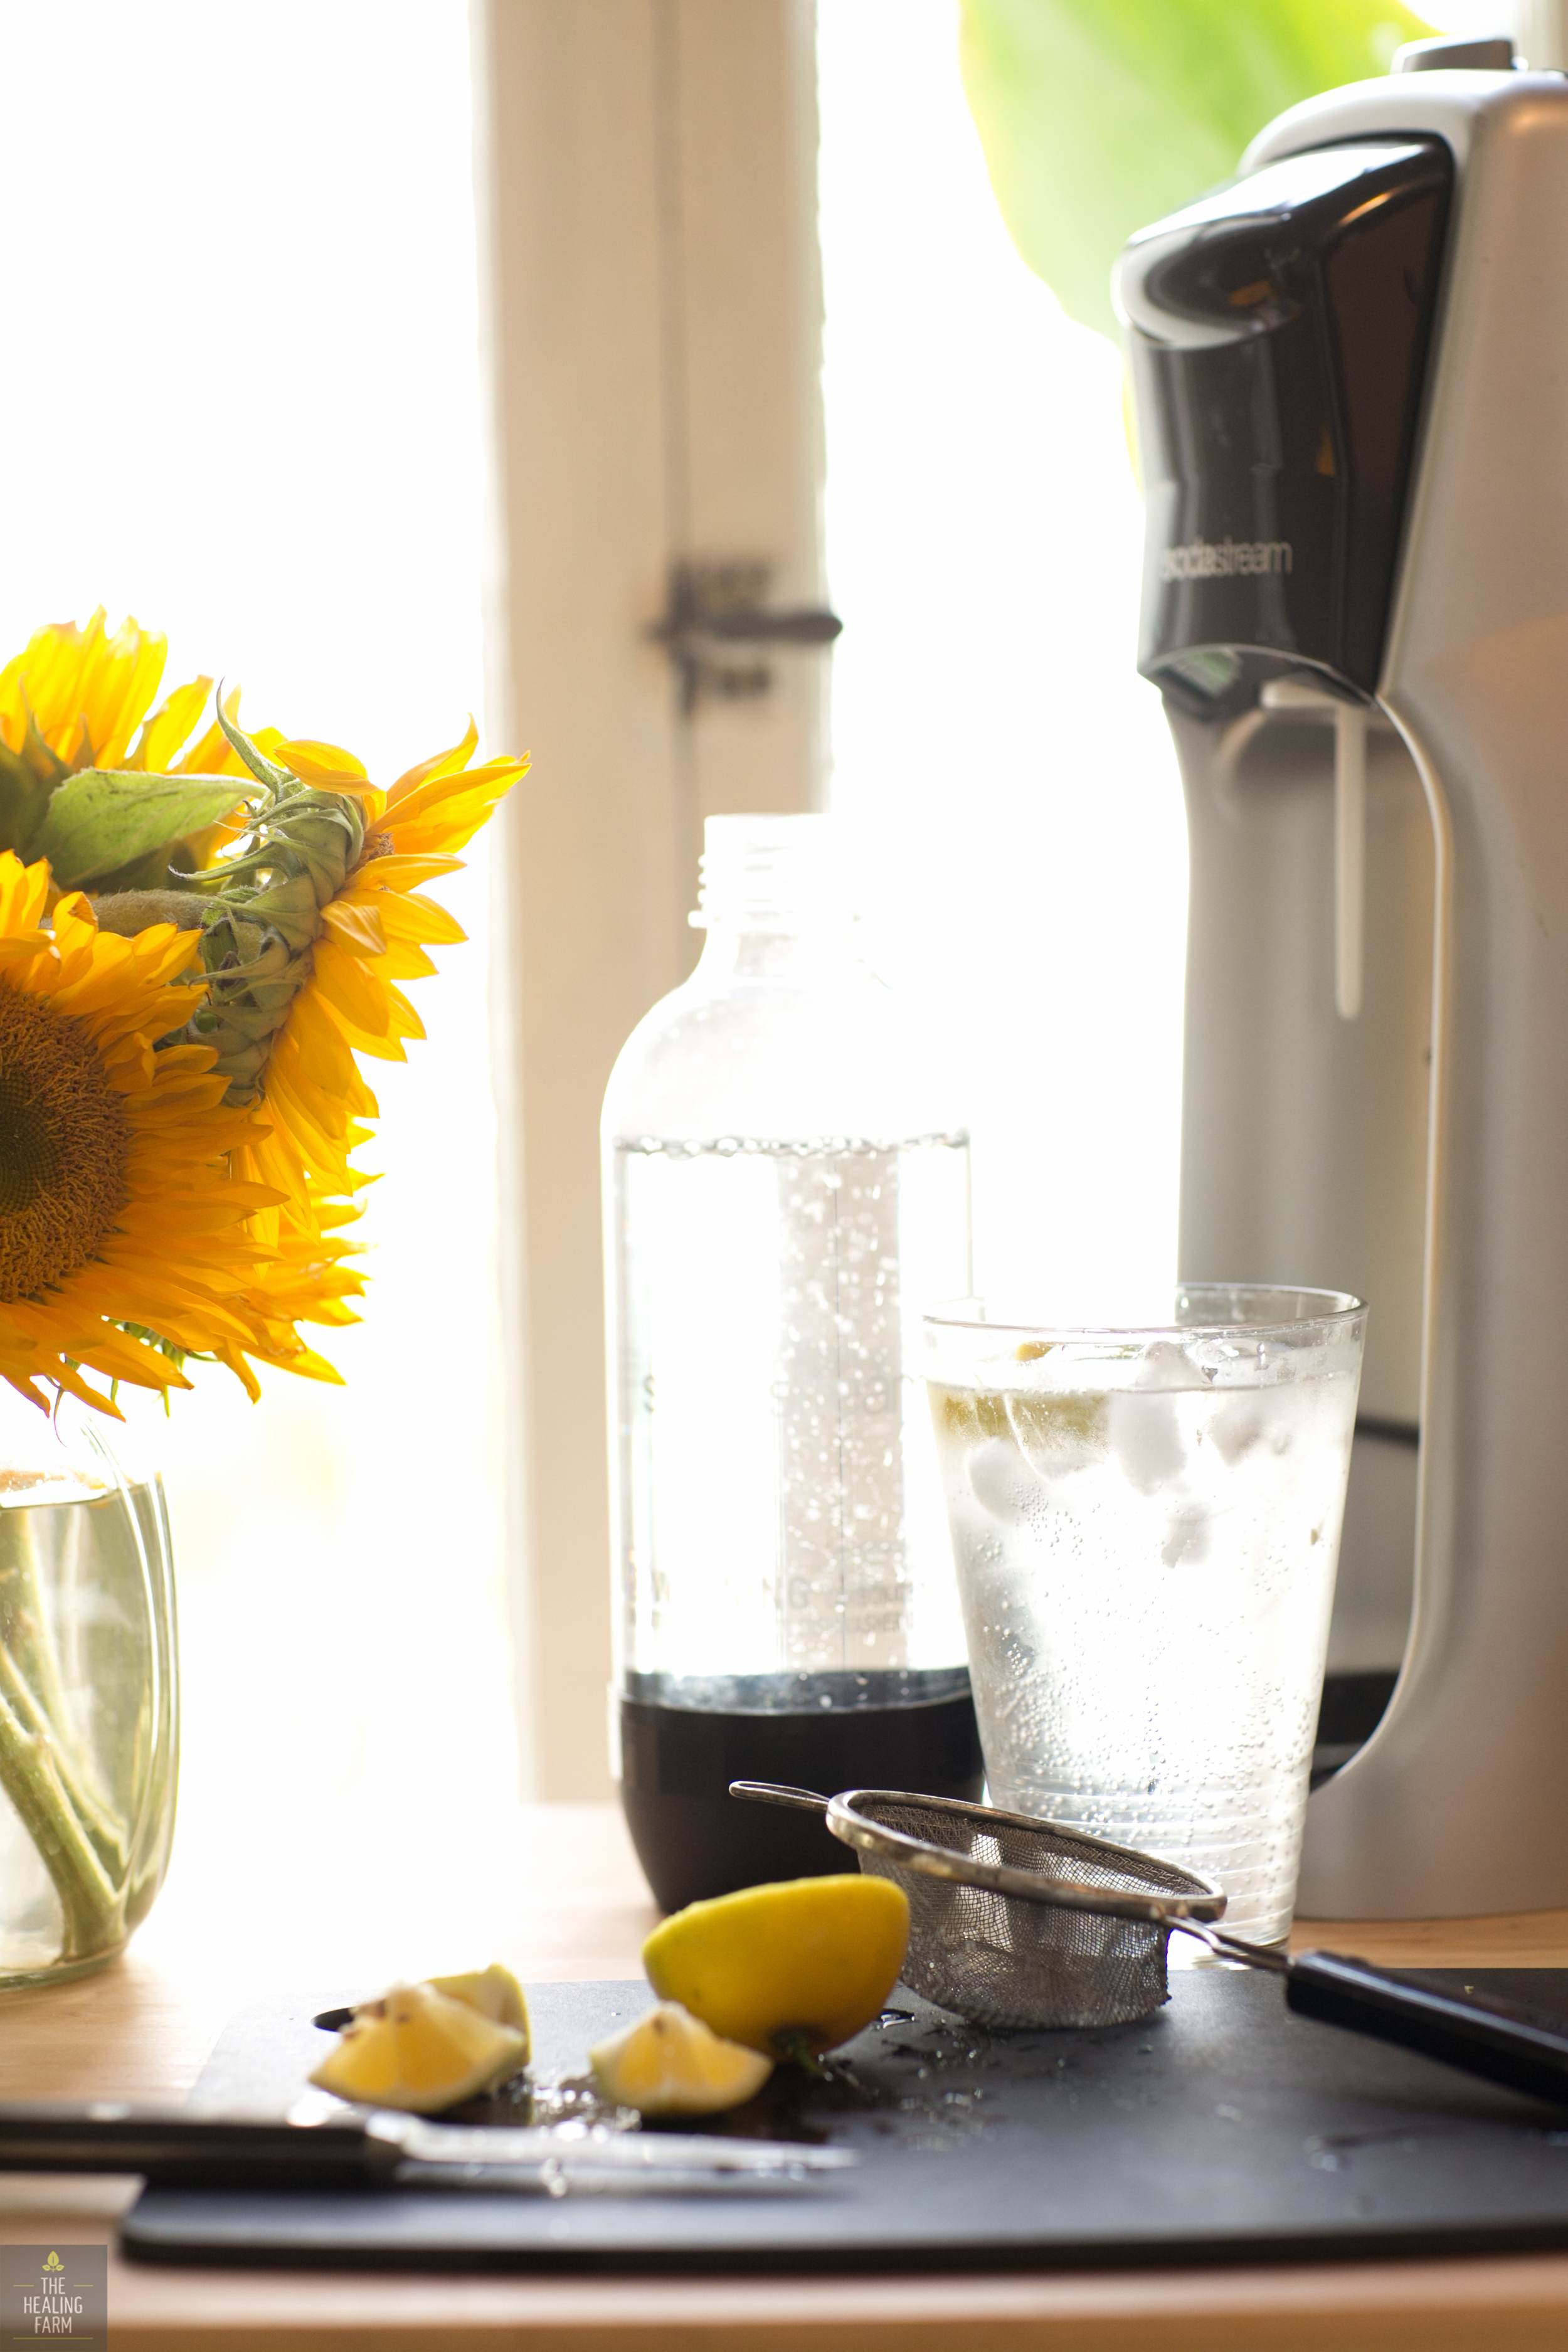 Soda Streamis a kitchen essential!